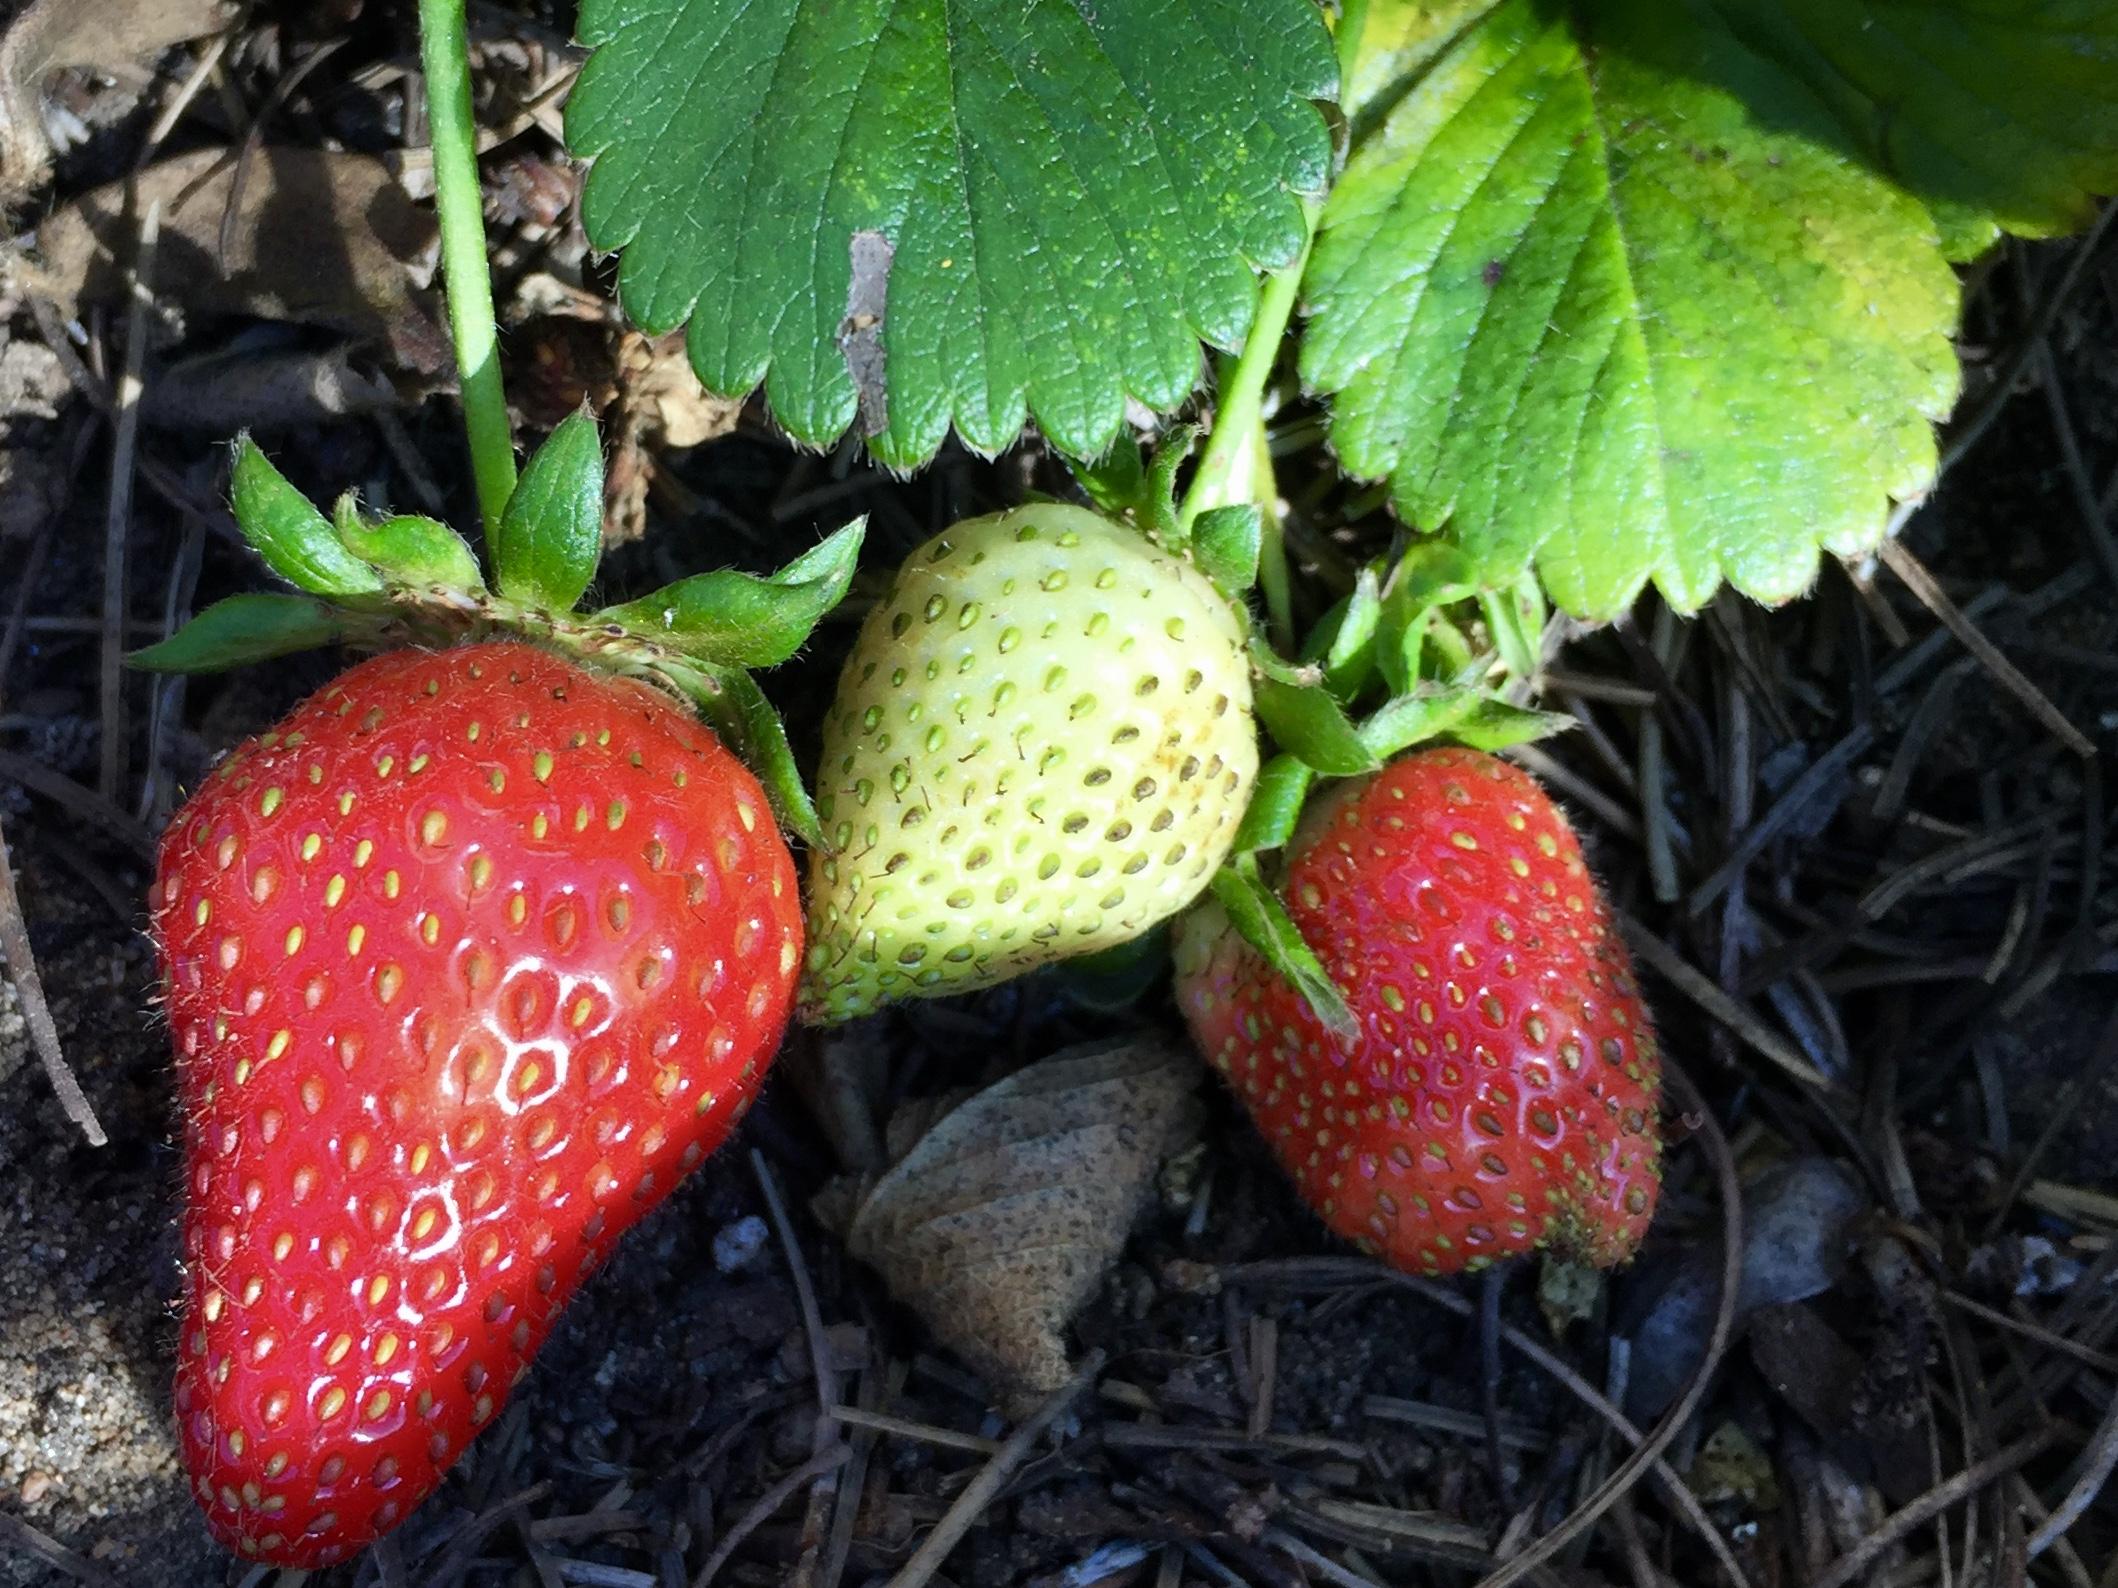 'Seascape' strawberries